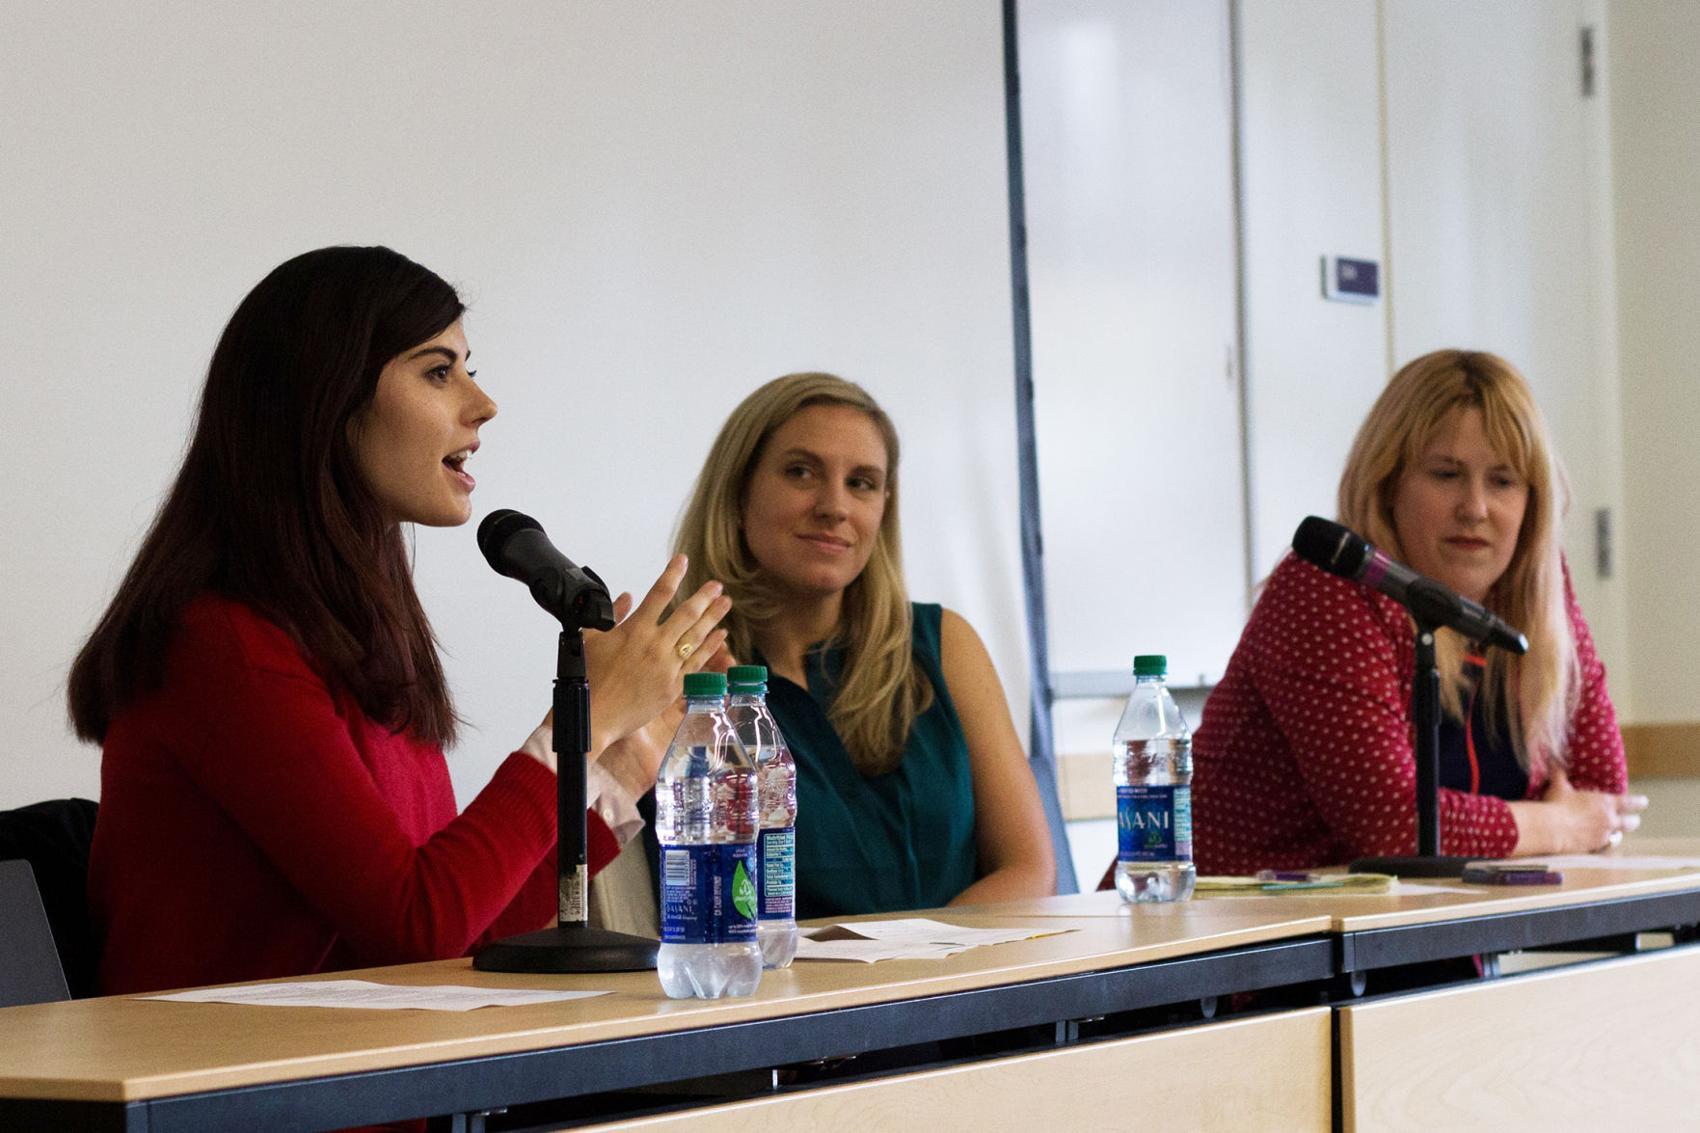 Women in Politics - NARAL